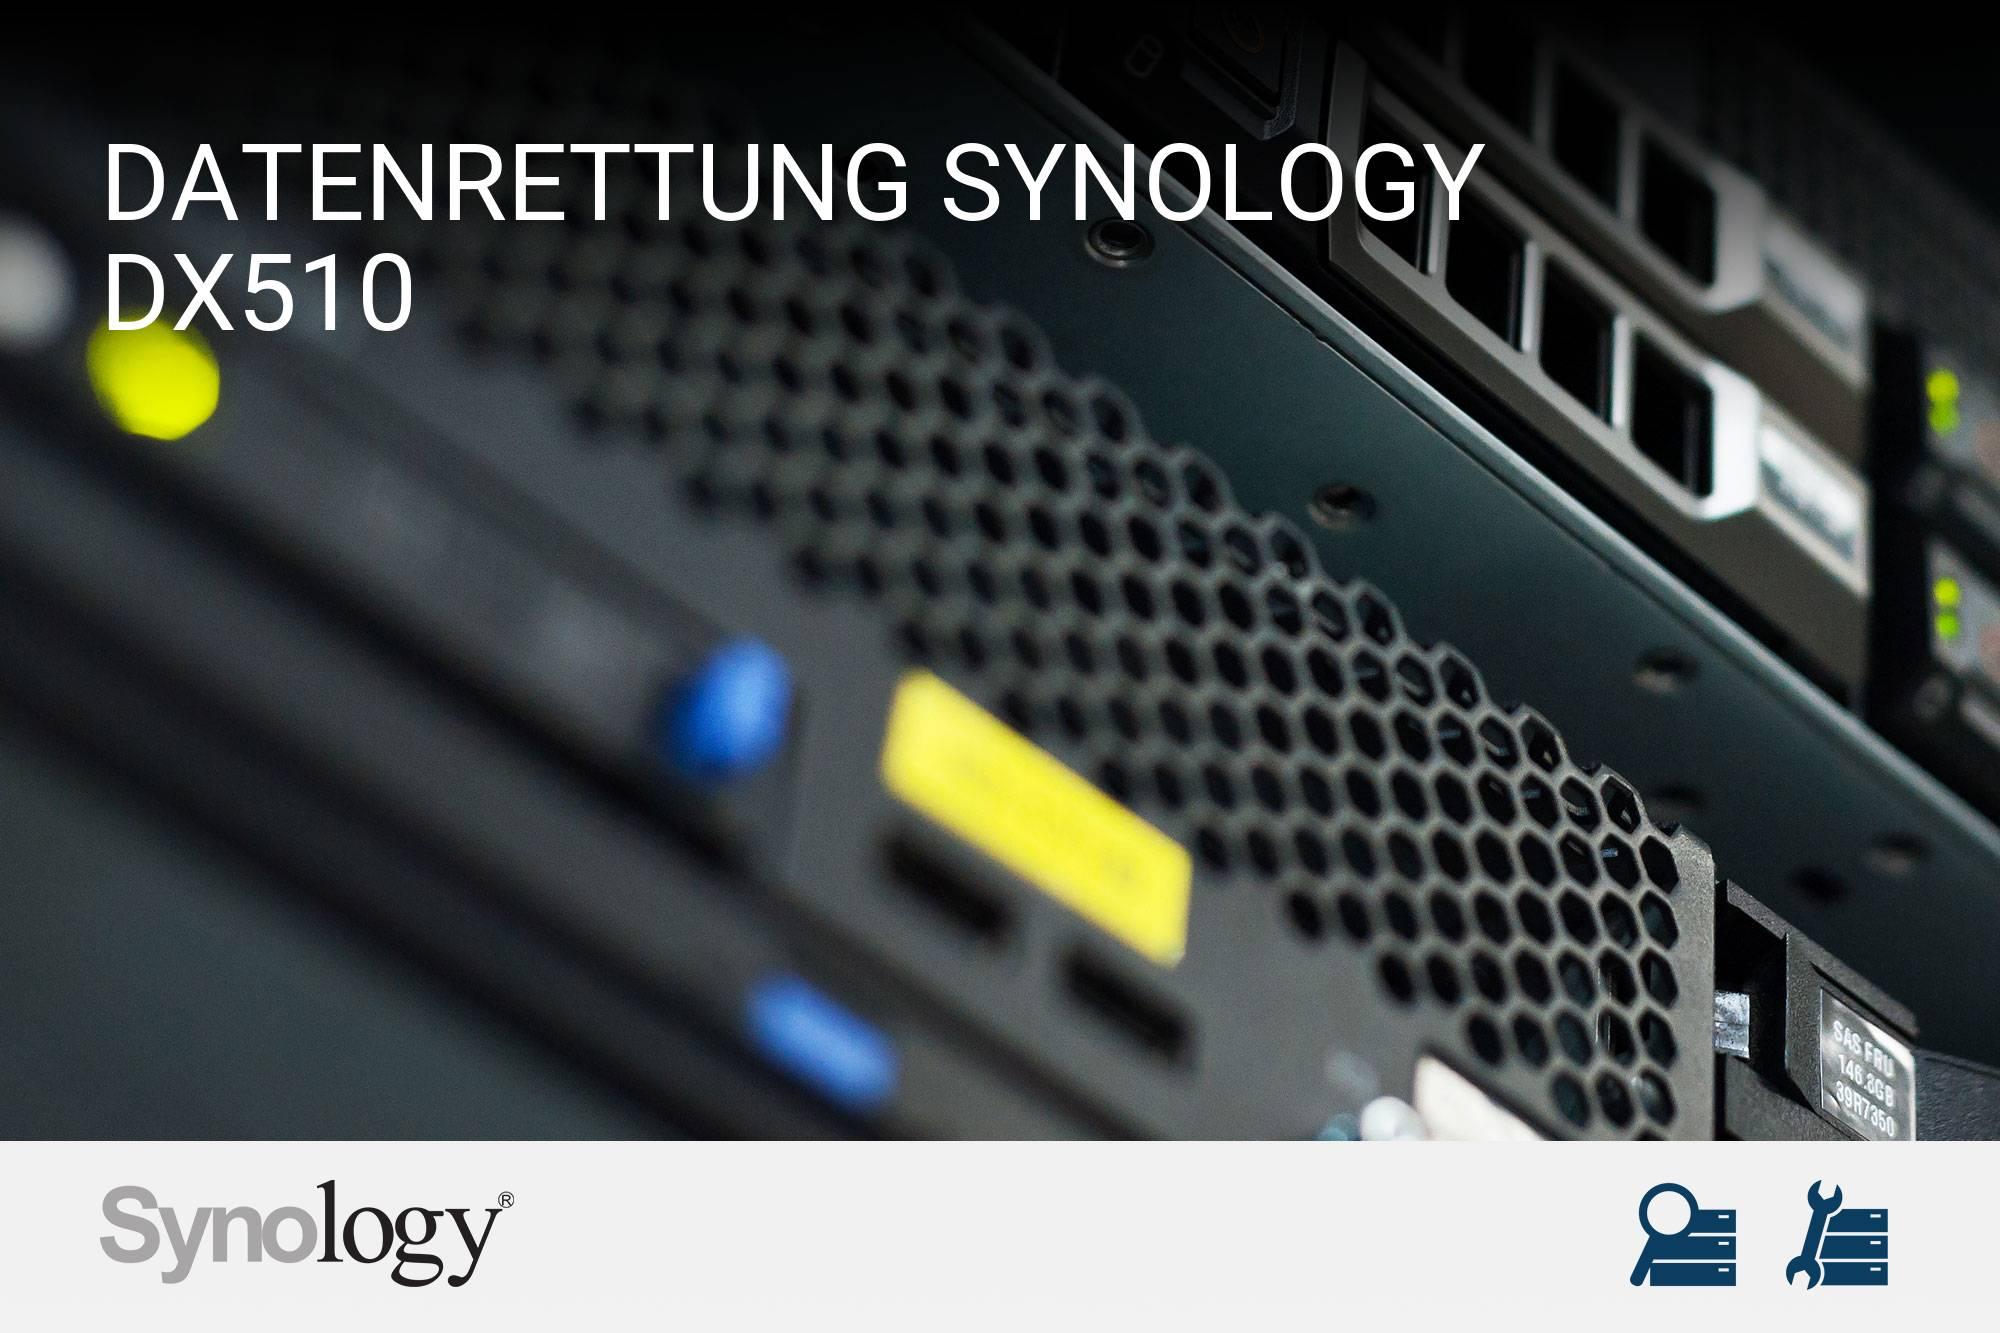 Synology DX510